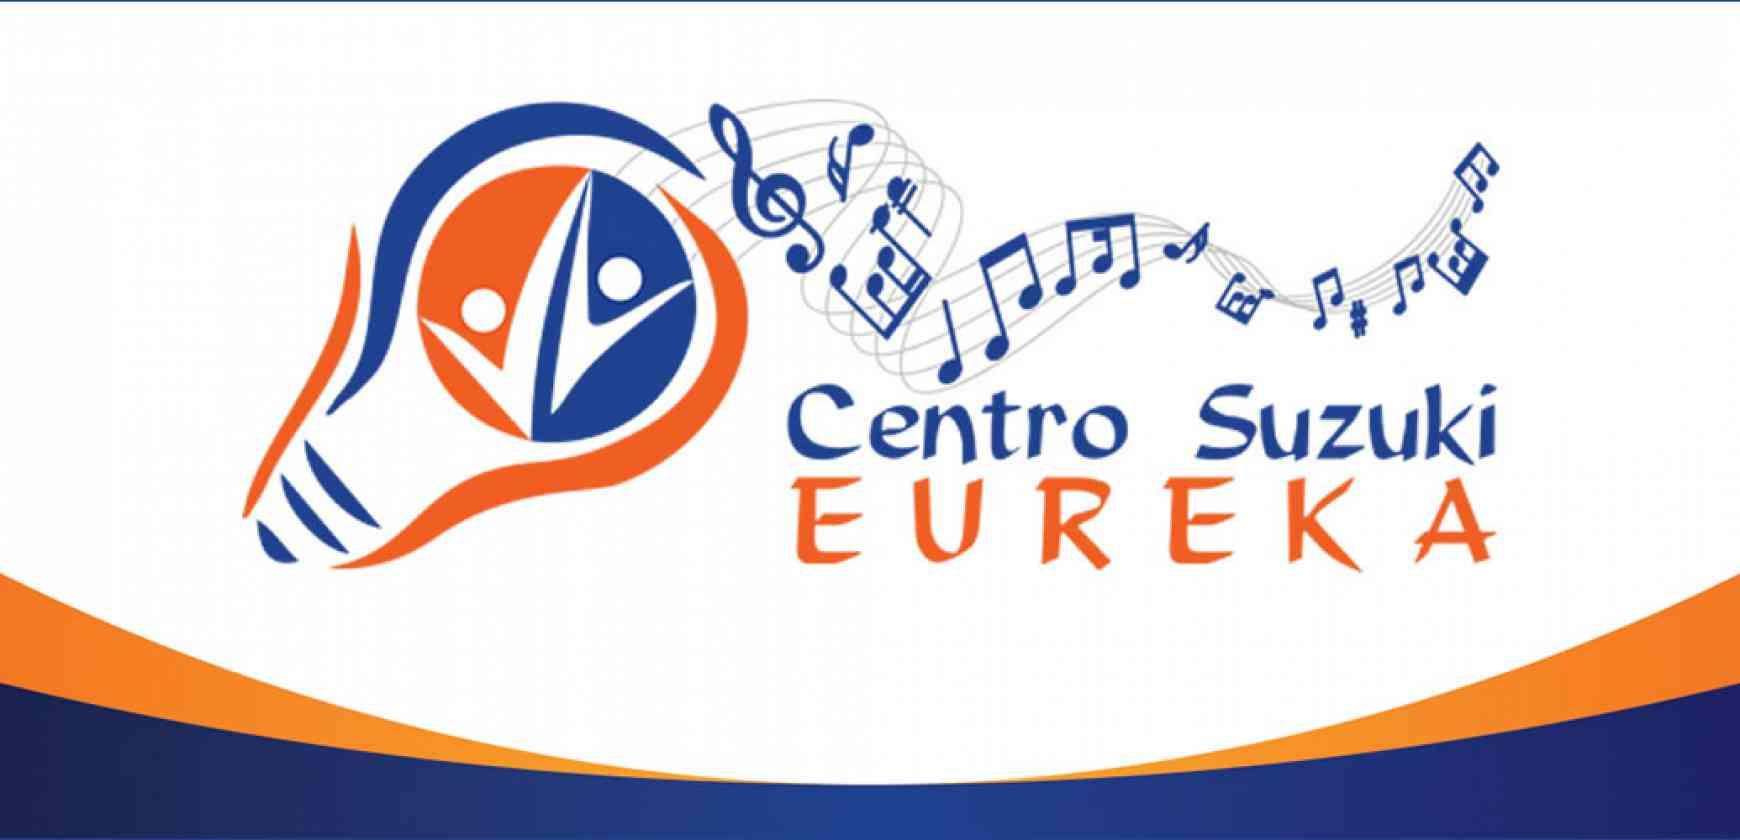 Centro Suzuki Eureka